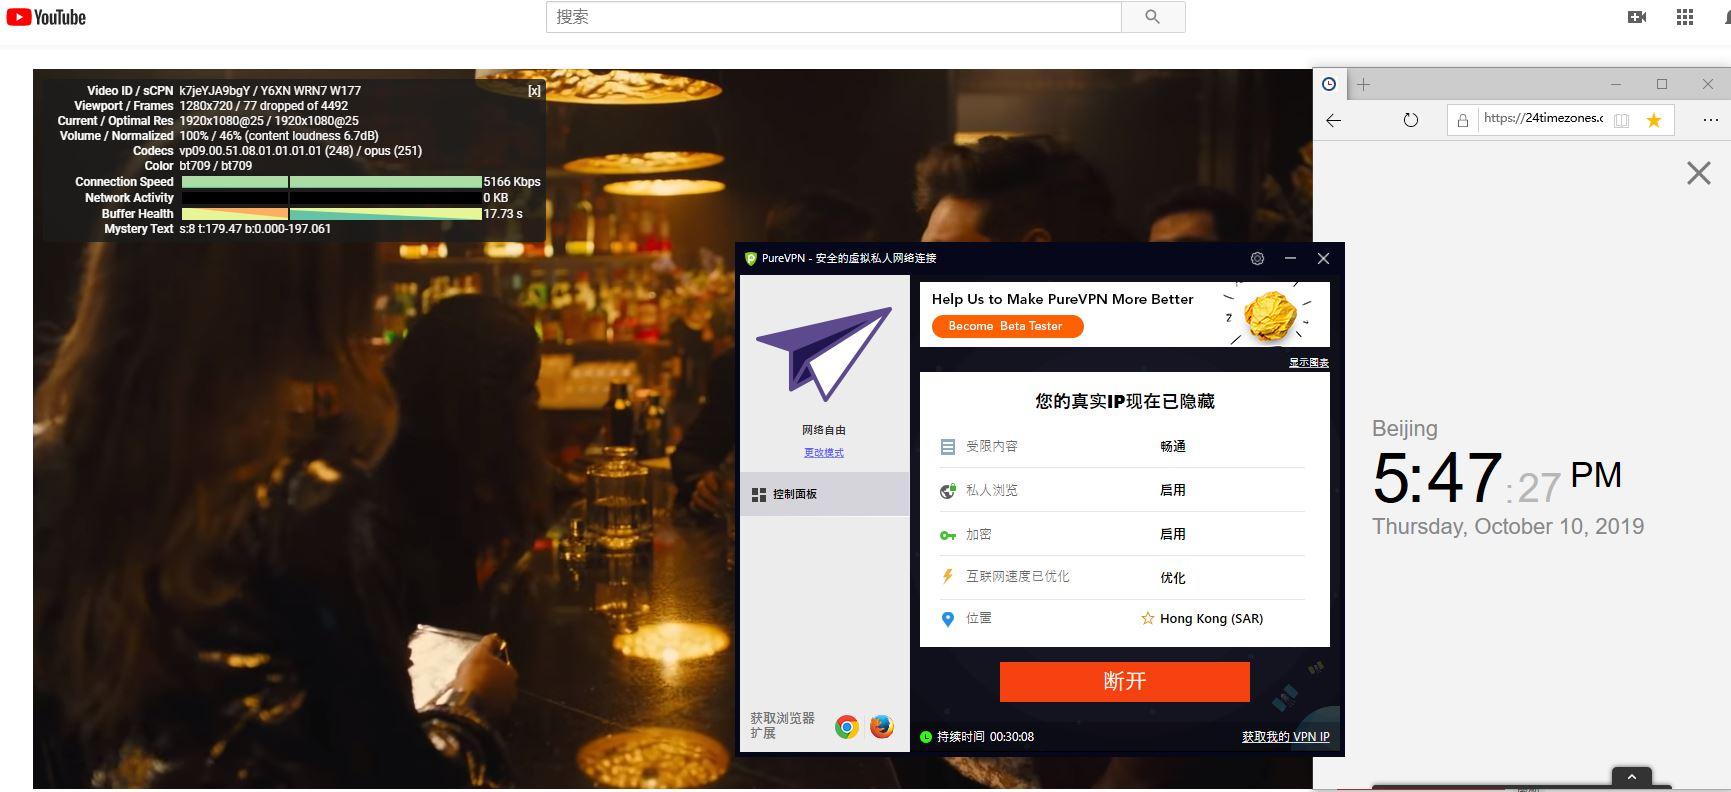 Windows PureVPN Hong Kong 中国VPN翻墙 科学上网 Youtube测速-20191010